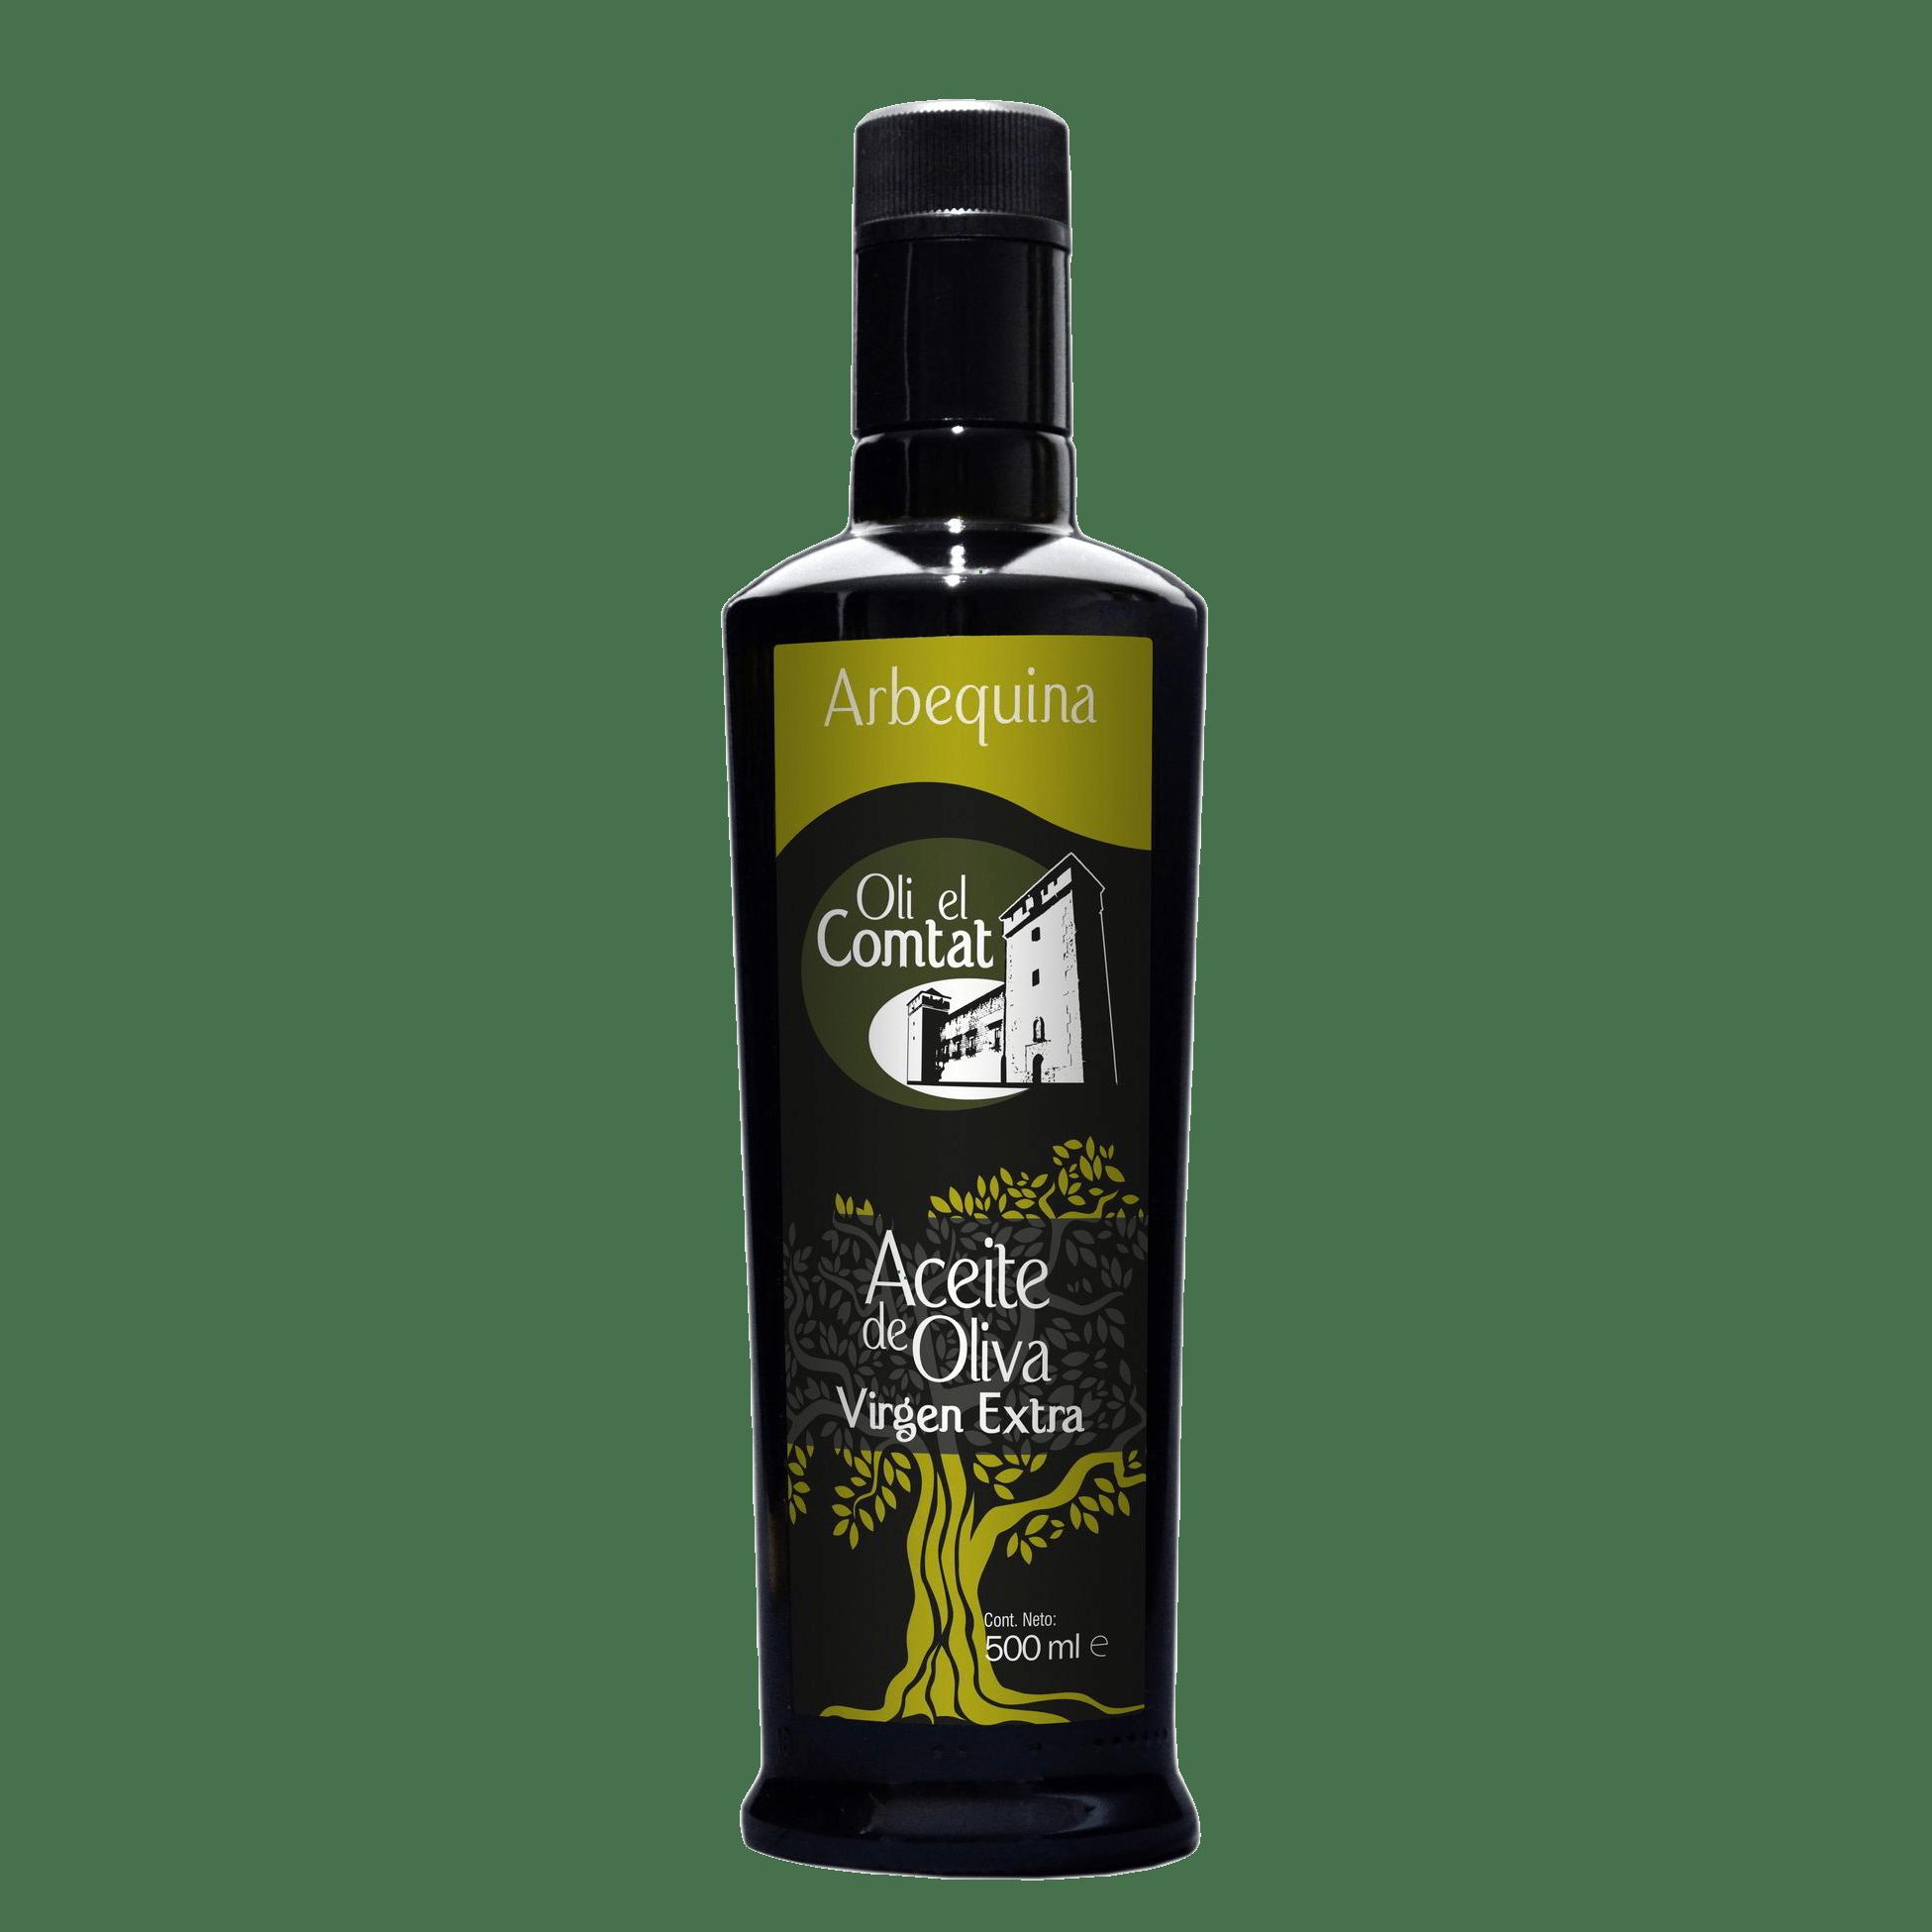 Aceite_ de_oliva_virgen_extra_arbequina_500ml